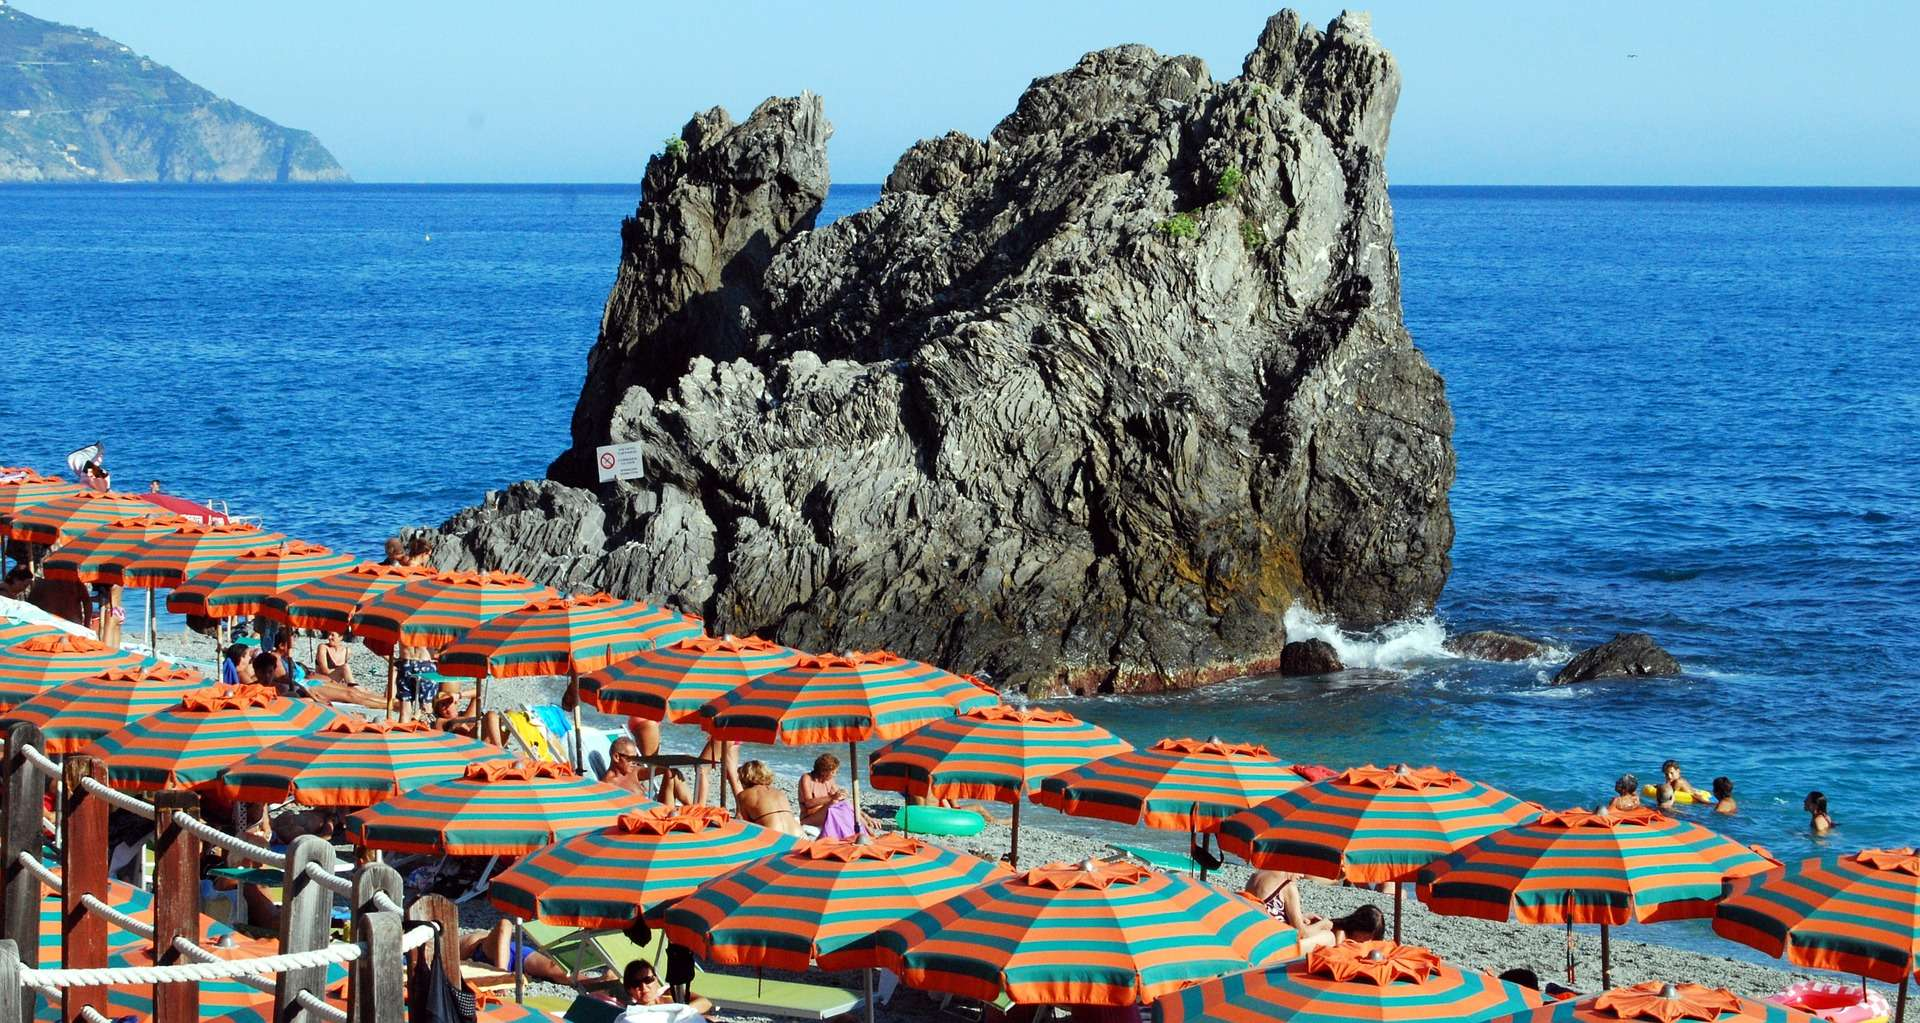 liguria-beach genoa italy